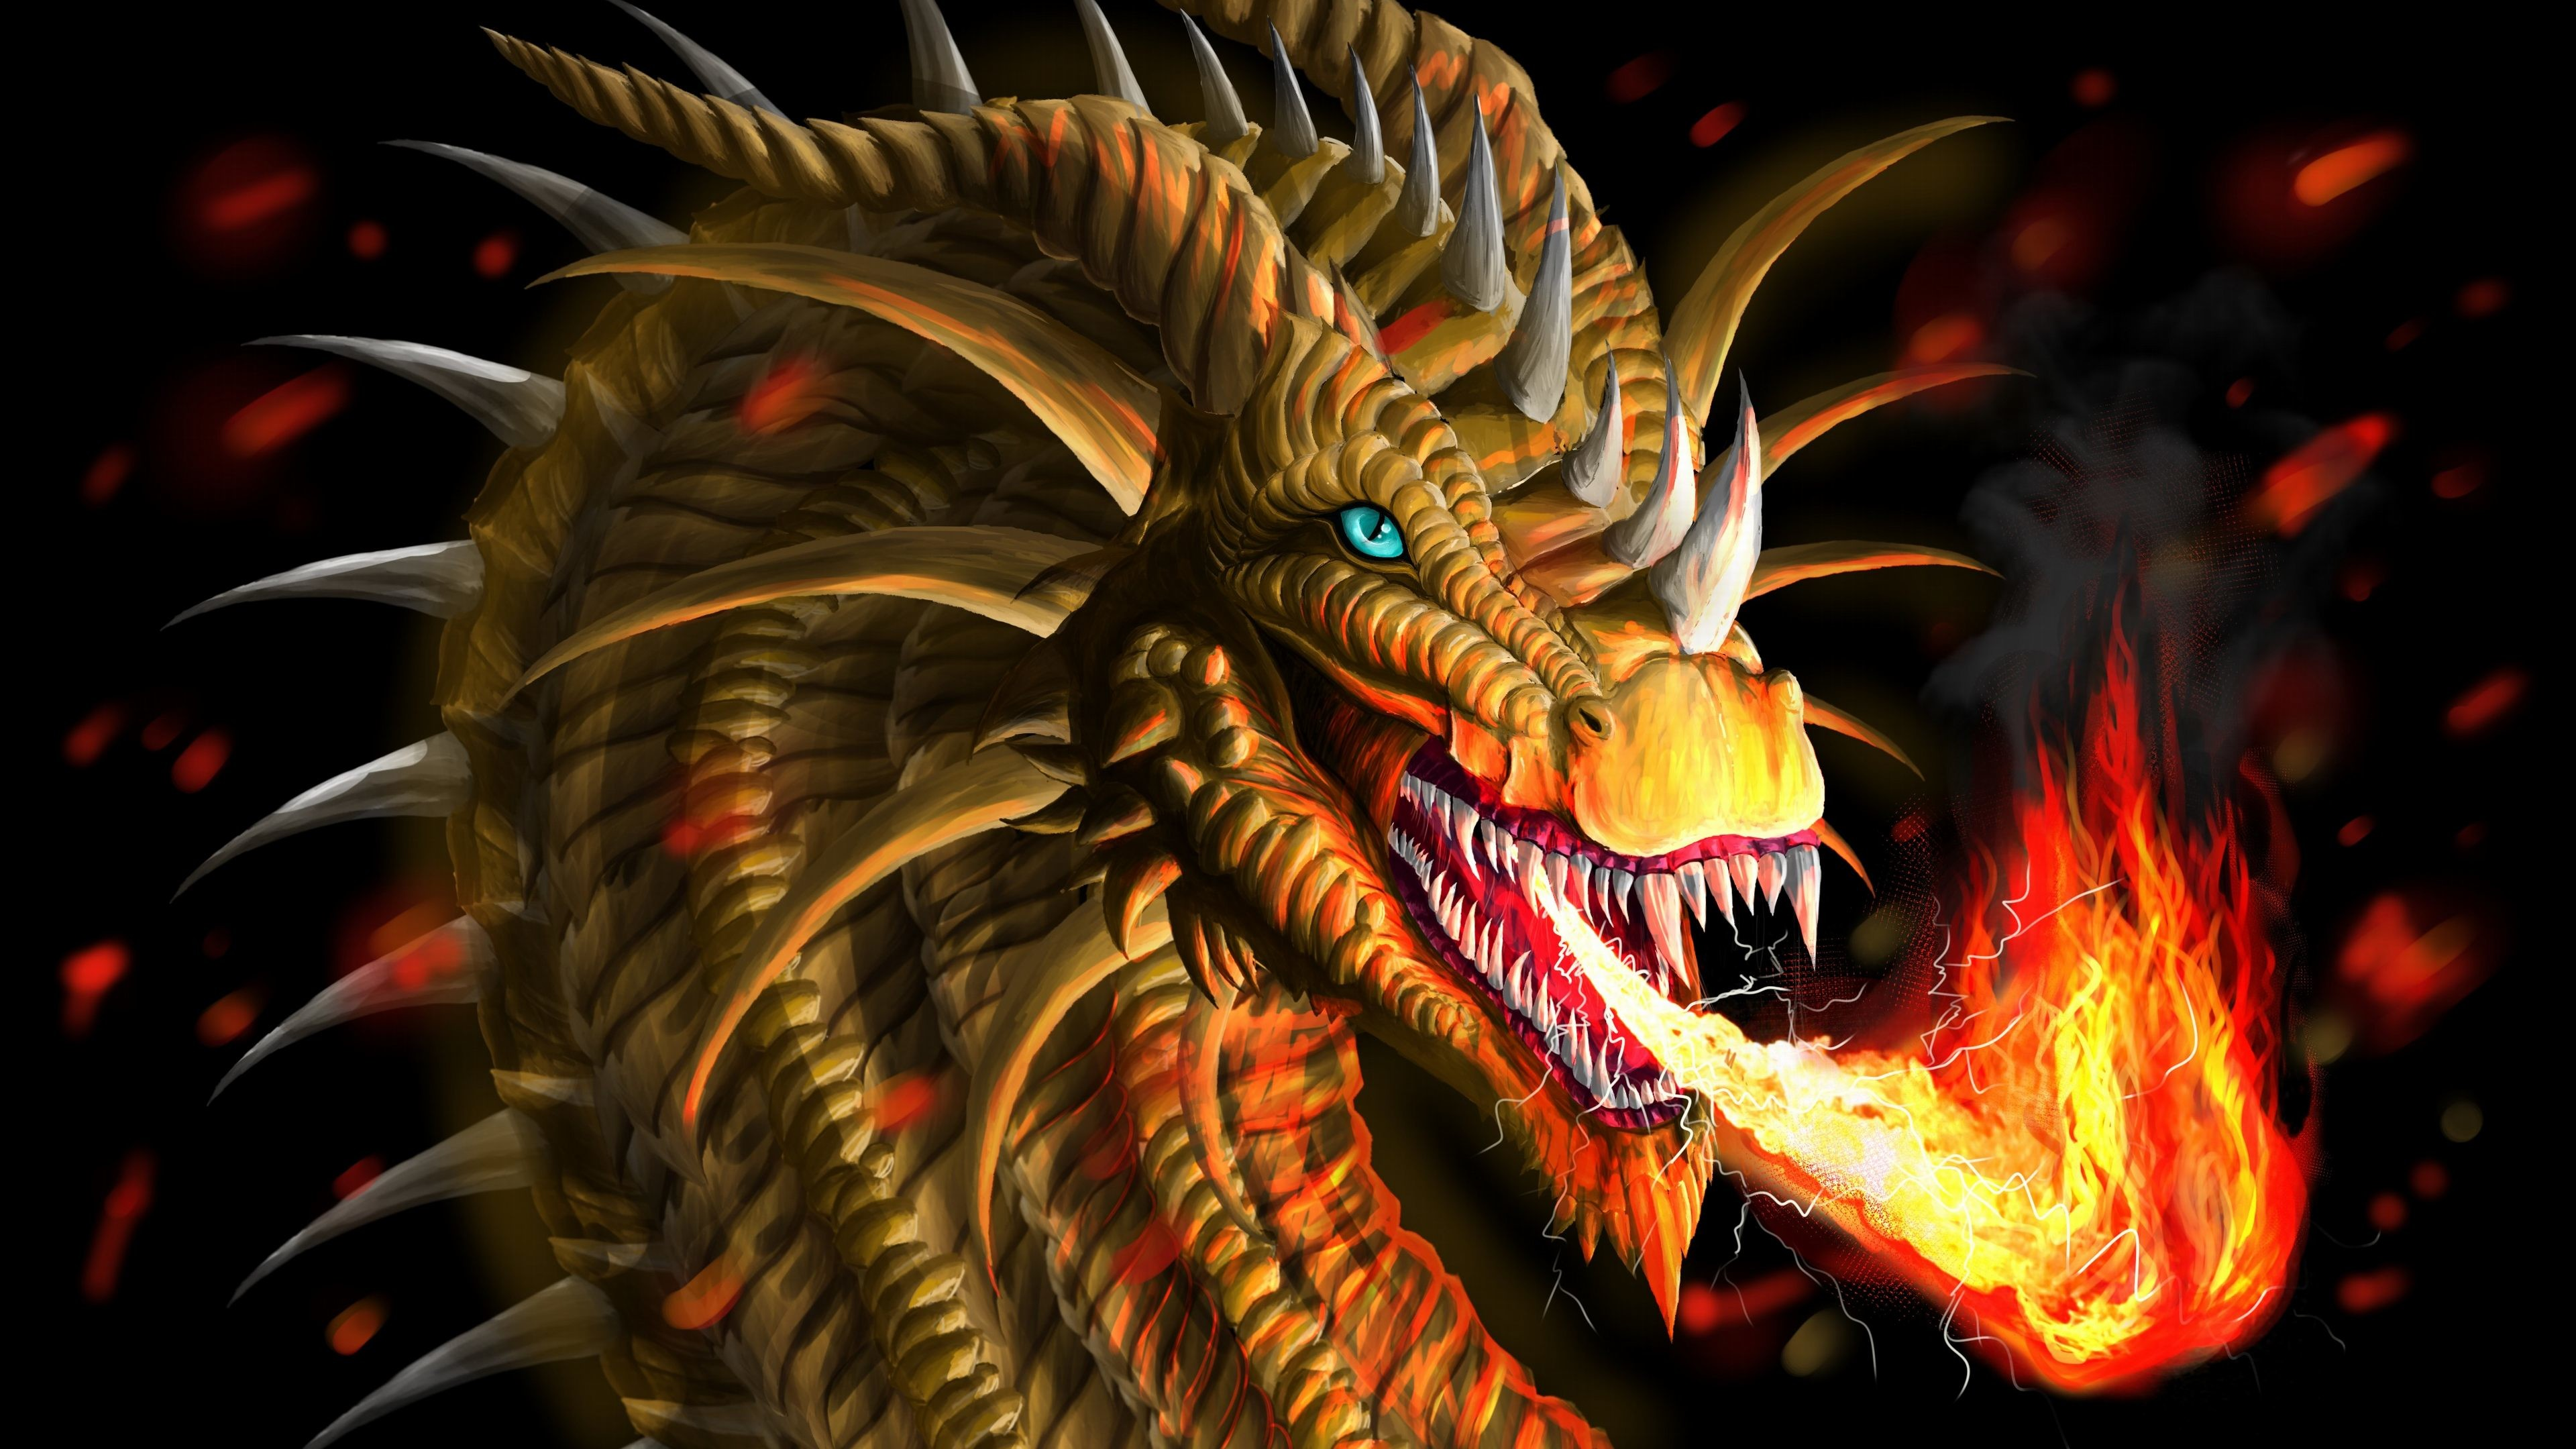 Hd Fantasy Girl Wallpapers 1080p Epic Dragon Wallpaper 73 Images